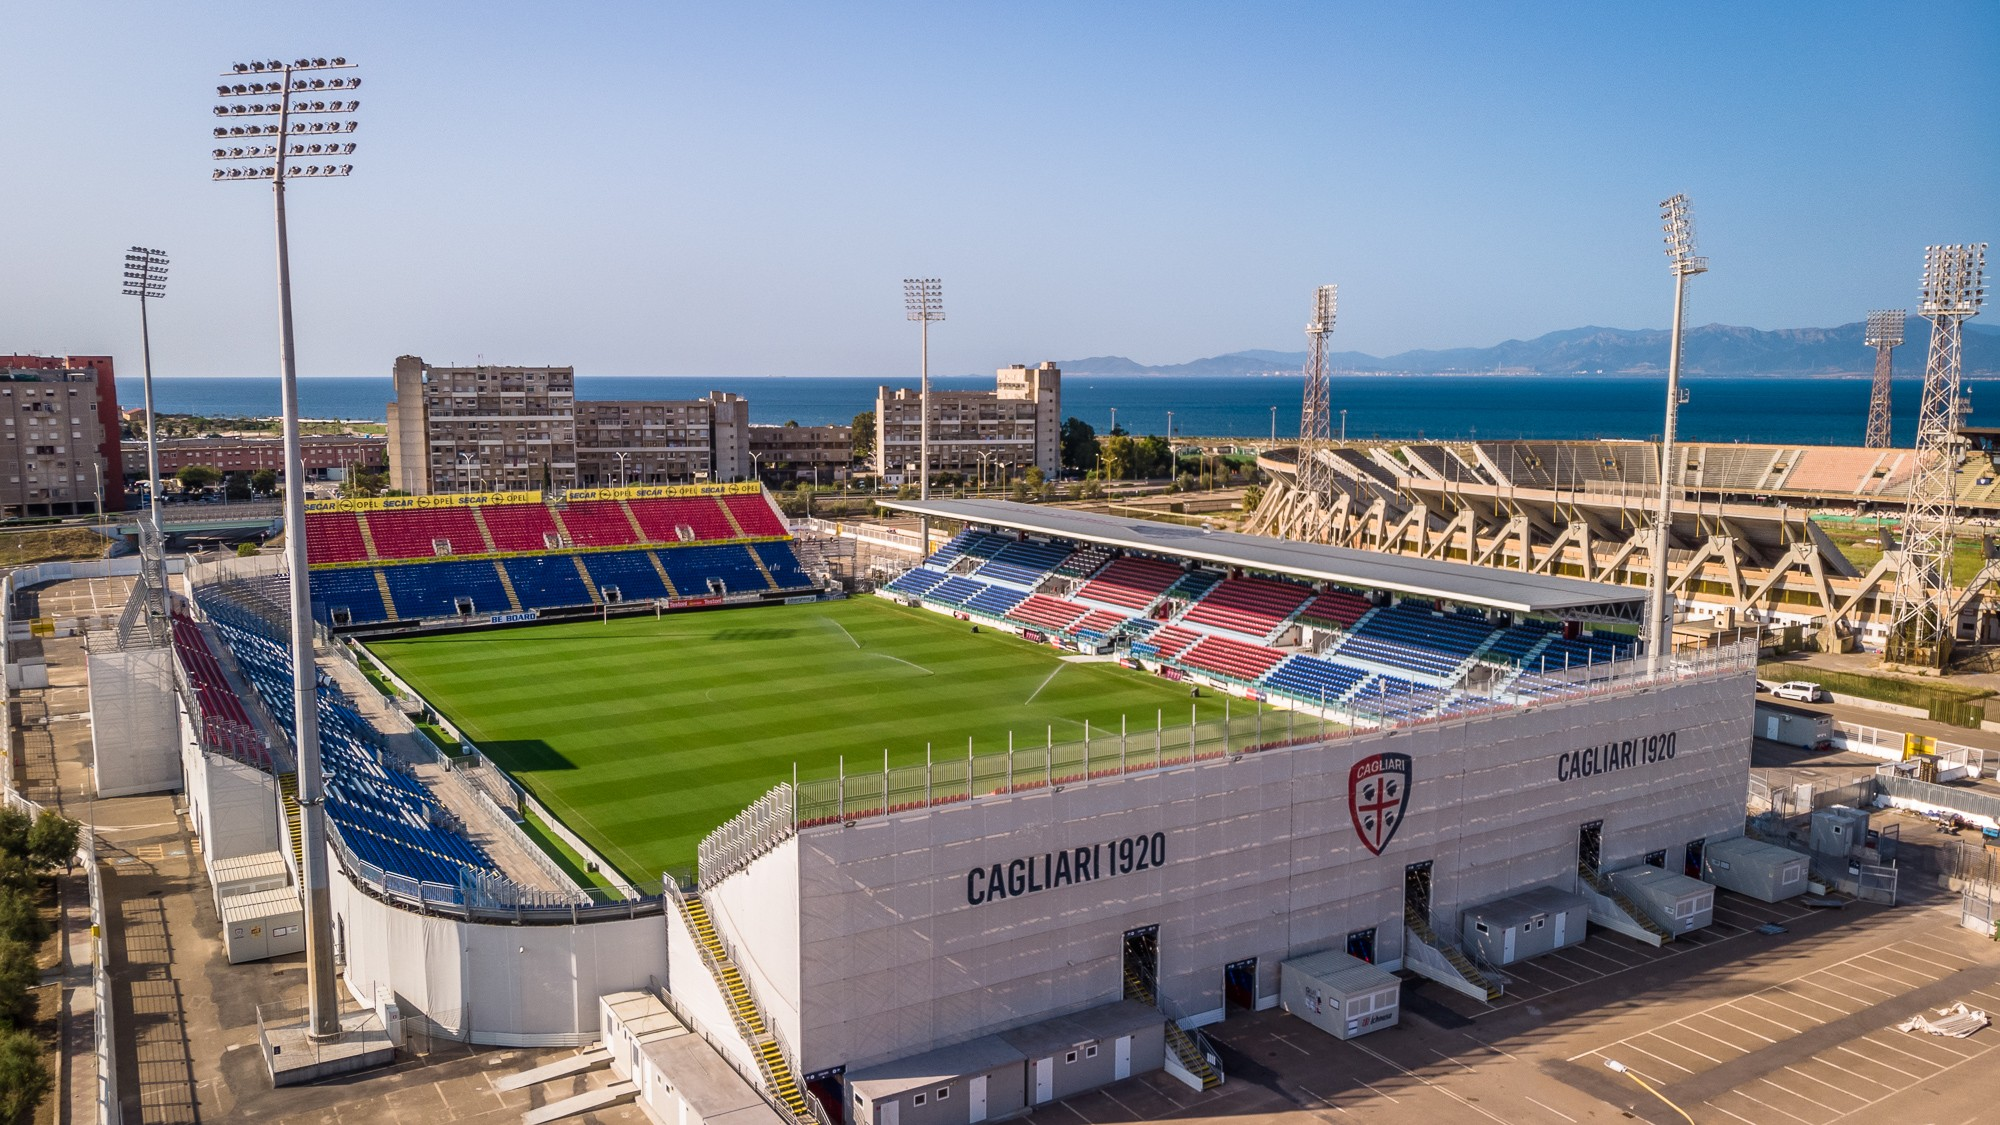 Prediksi Bola Laga - Sardegna Stadium - hasilprediksi